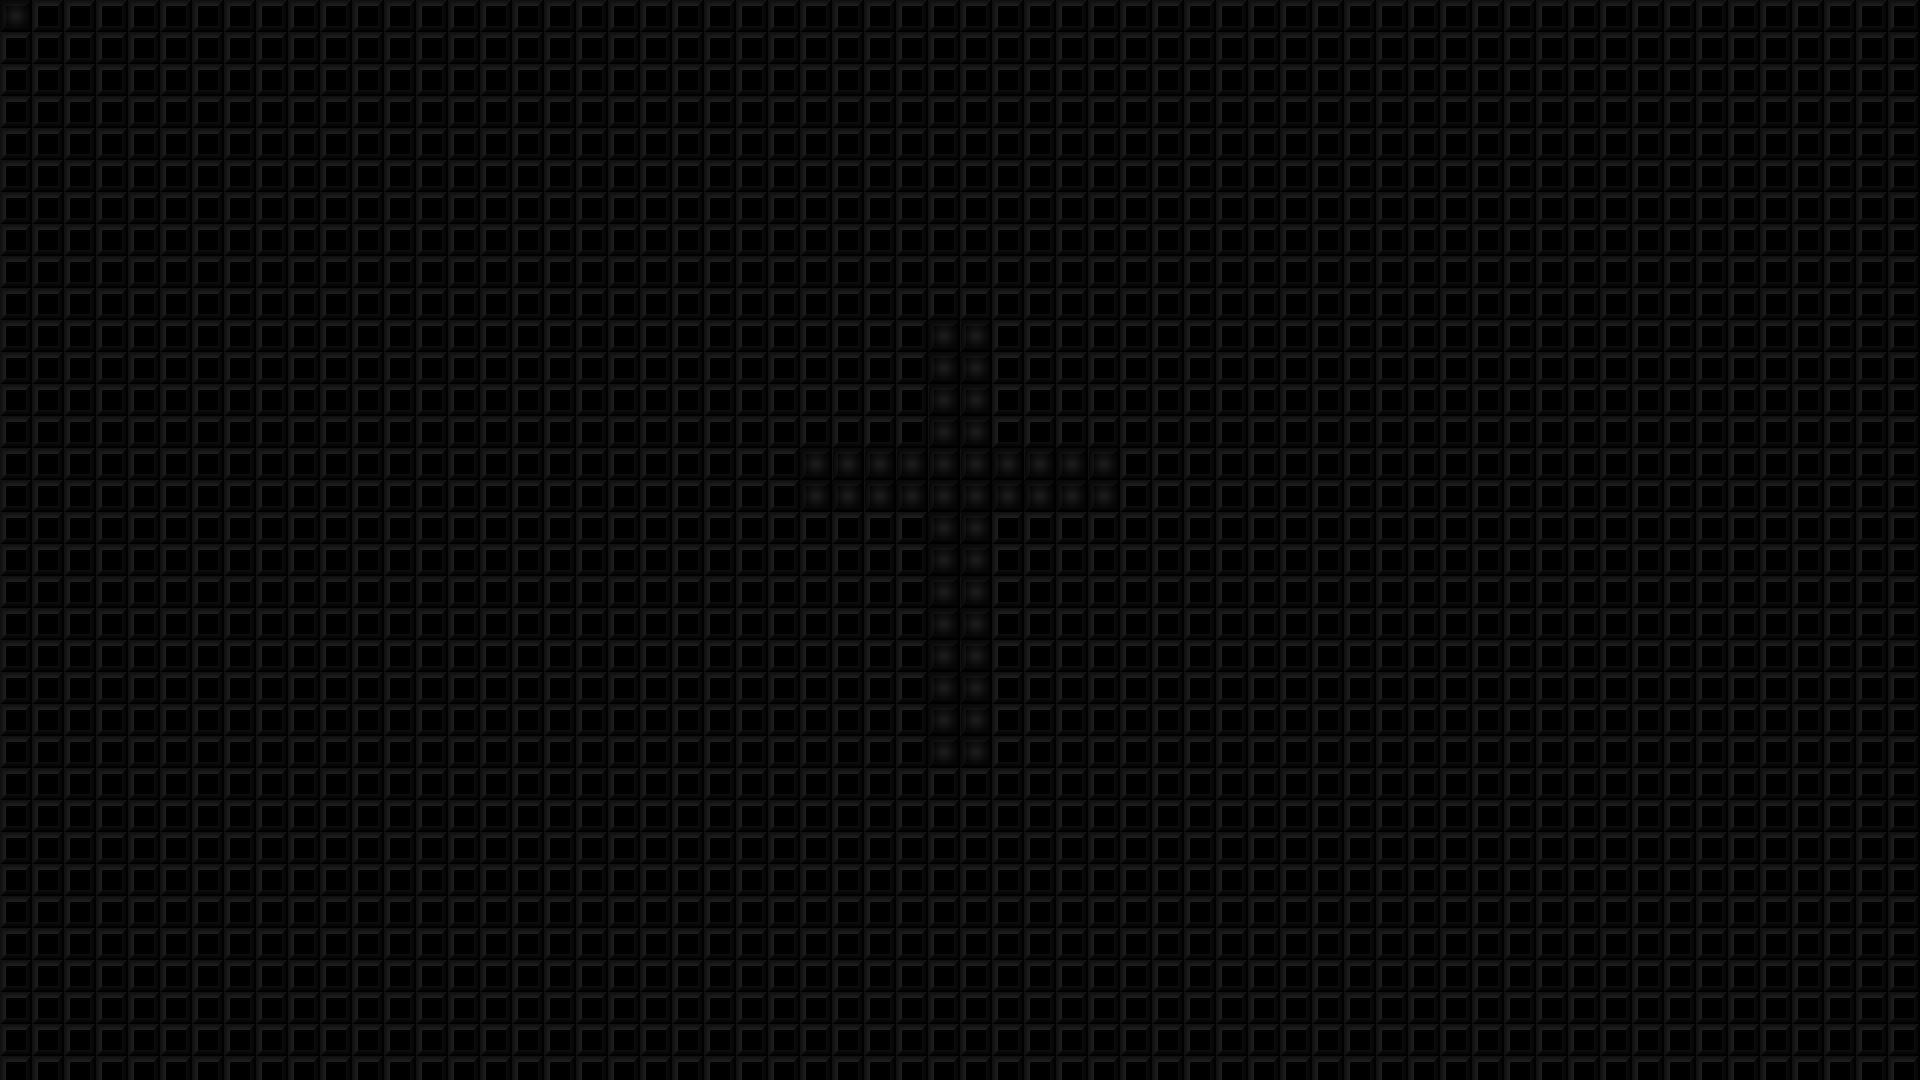 on black background | Tumblr